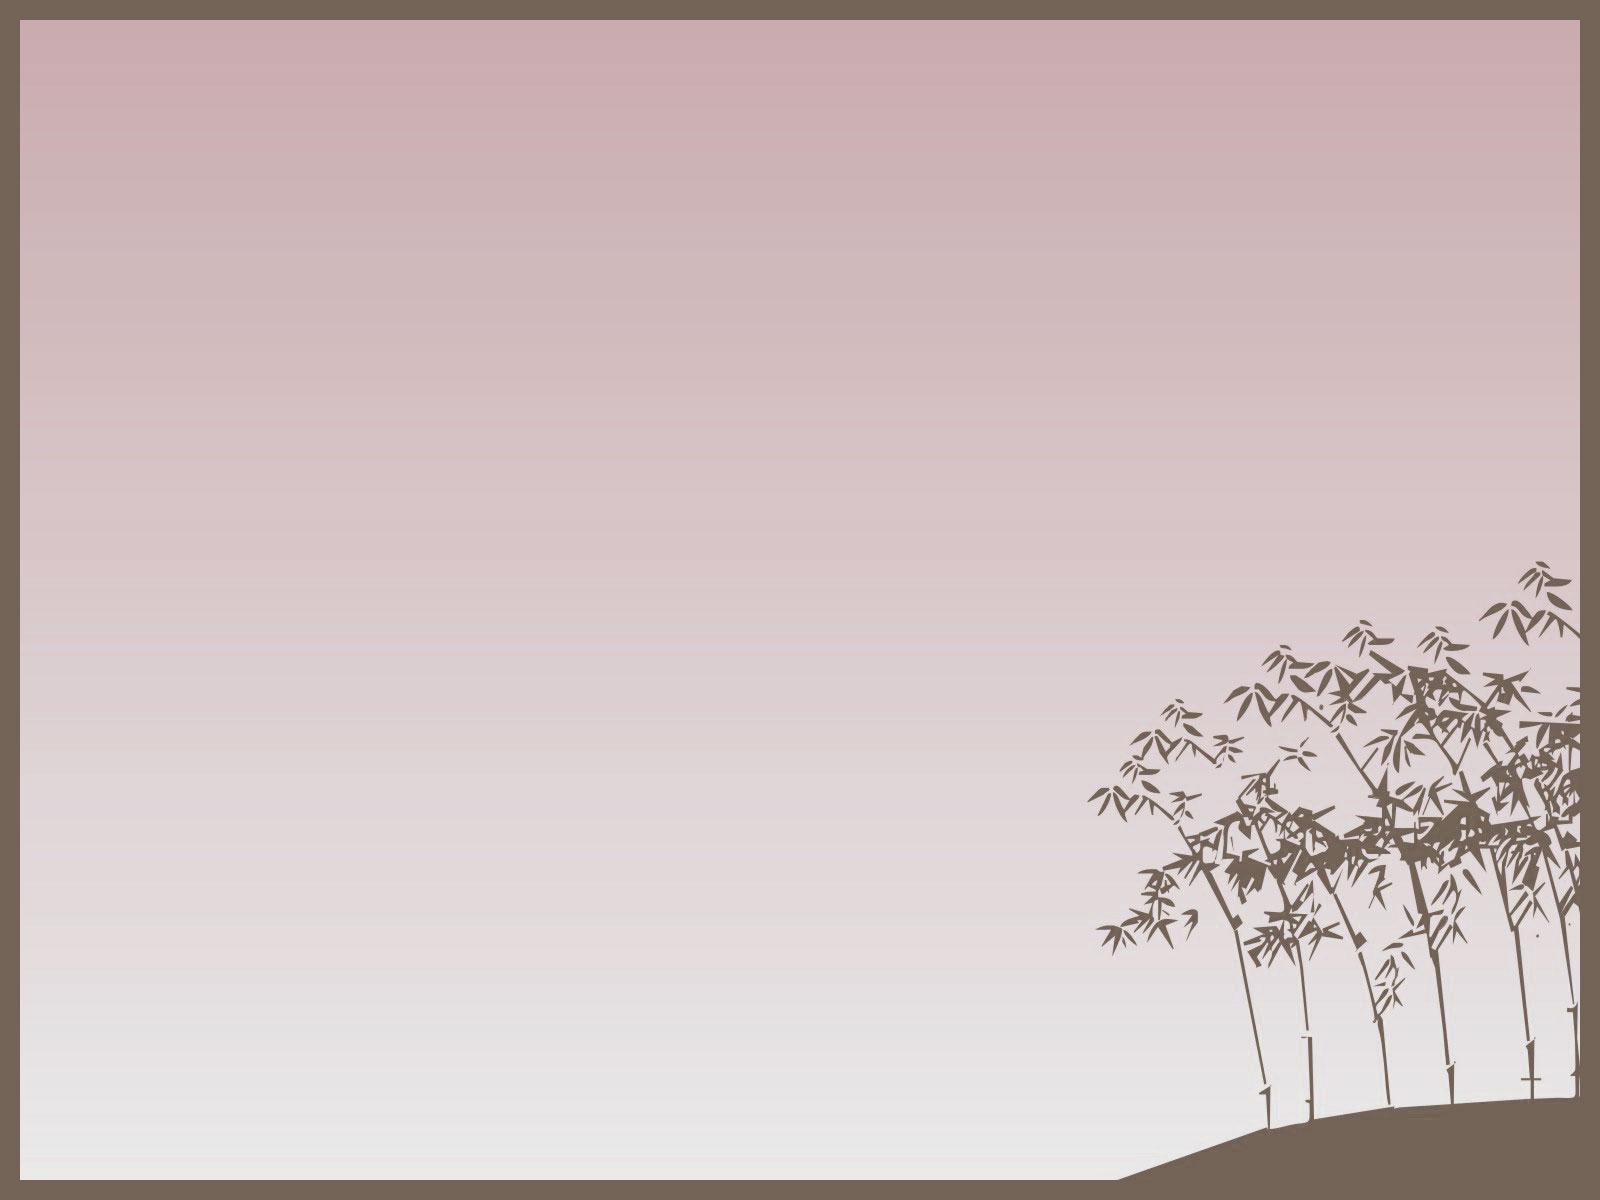 free themes - Sayfa 18 / 122 - Magento Free Themes Free-Themes Ps ...